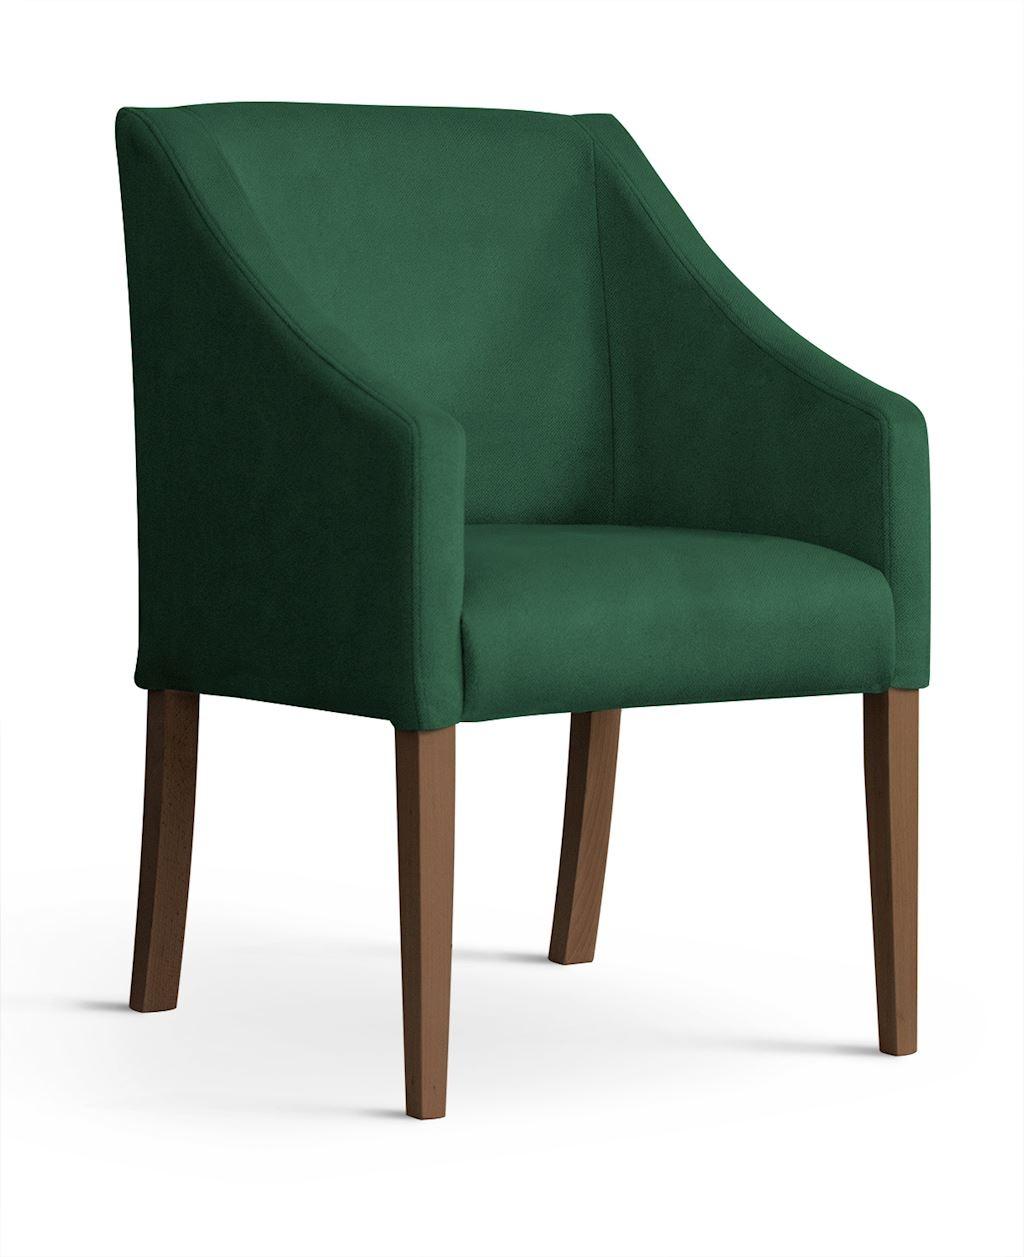 Fotoliu fix tapitat cu stofa, cu picioare din lemn Capri Green / Walnut, l58xA60xH89 cm imagine